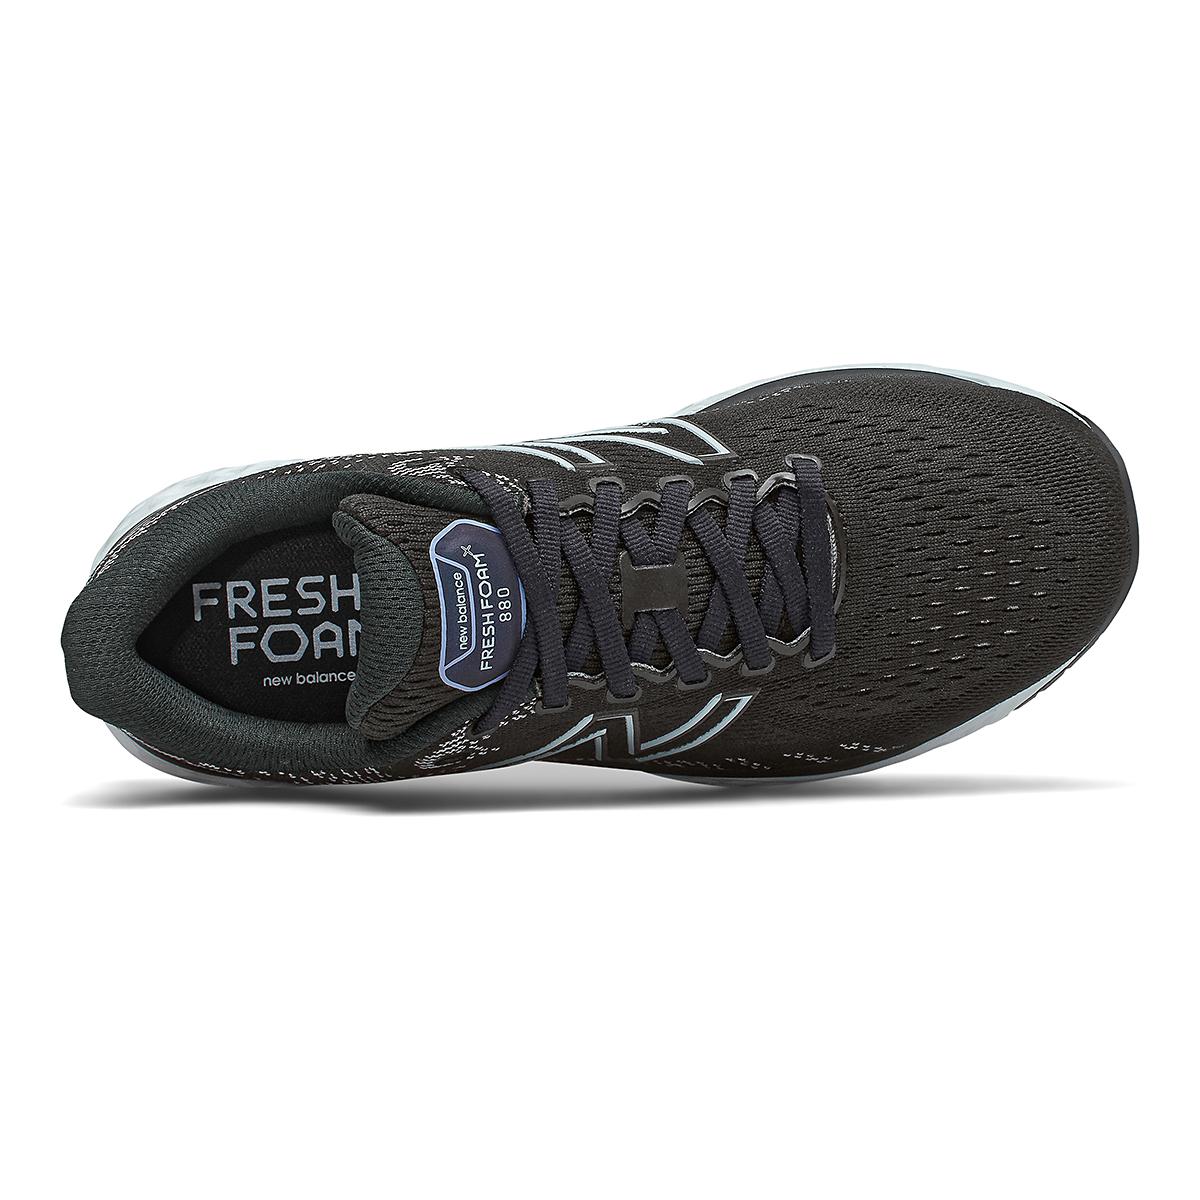 Women's New Balance 880V11 Running Shoe - Color: Black/Star Glo - Size: 5 - Width: Narrow, Black/Star Glo, large, image 3